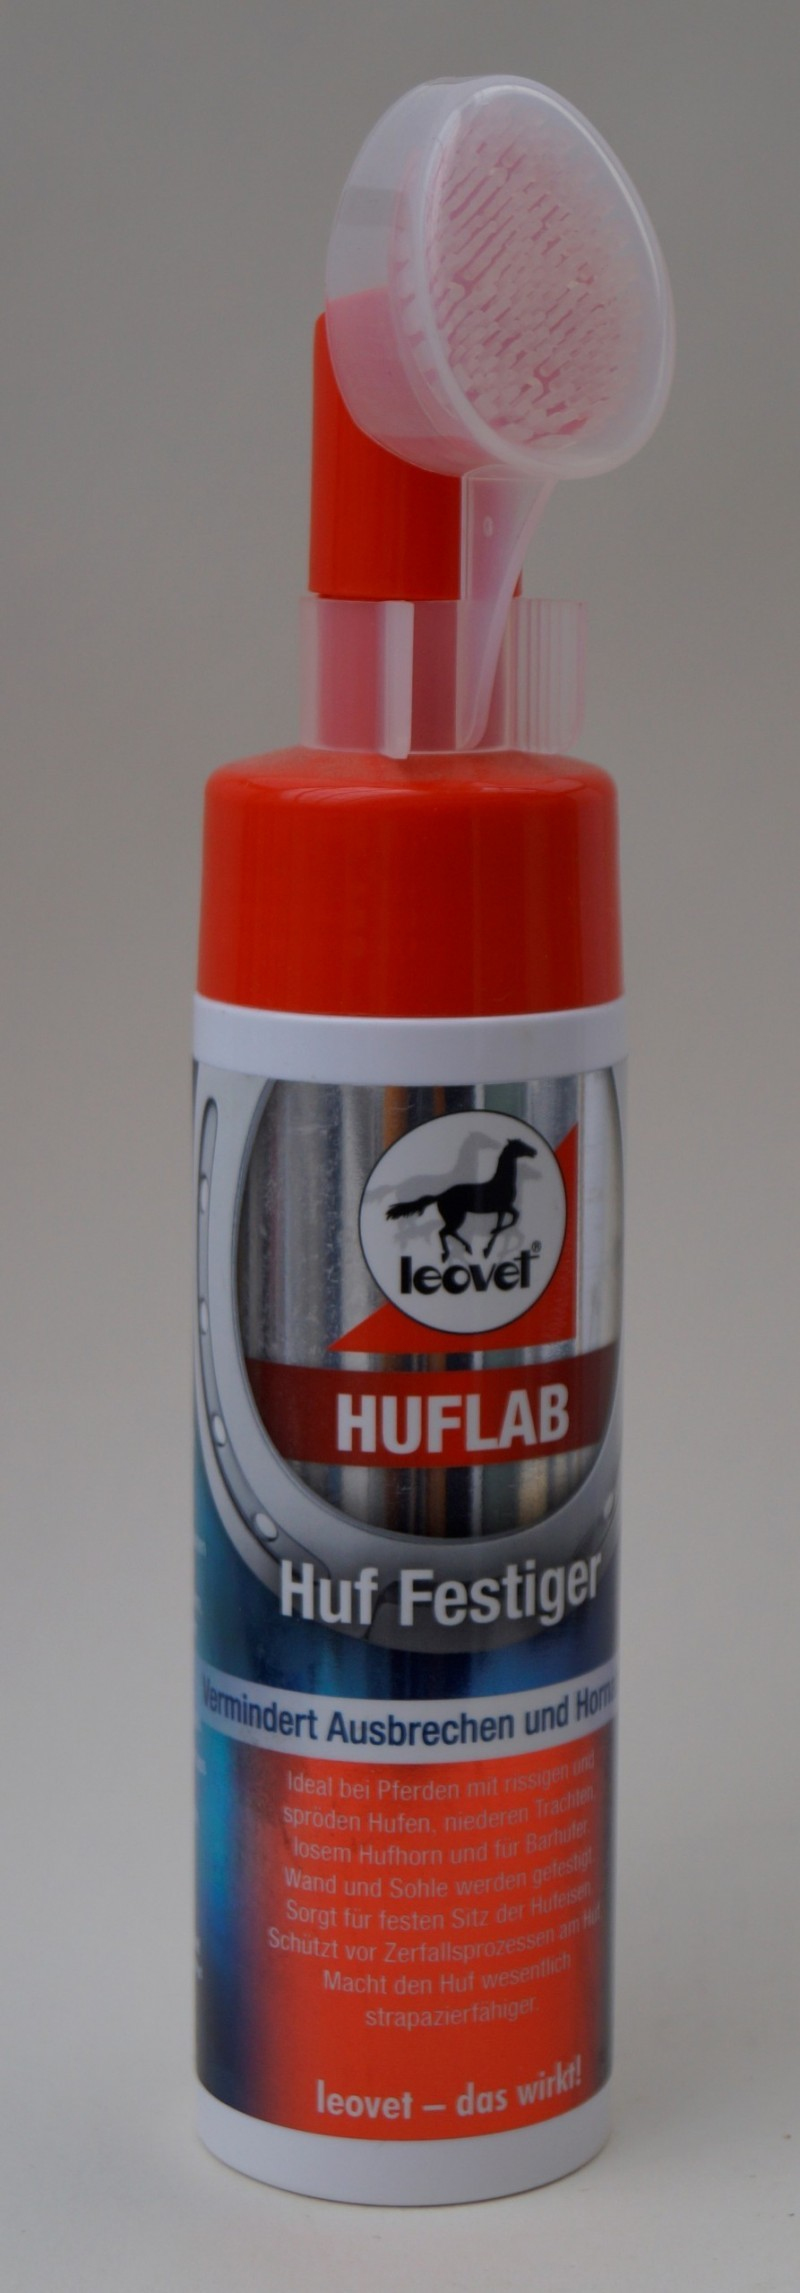 Leovet Huflab - Huf Festiger 1